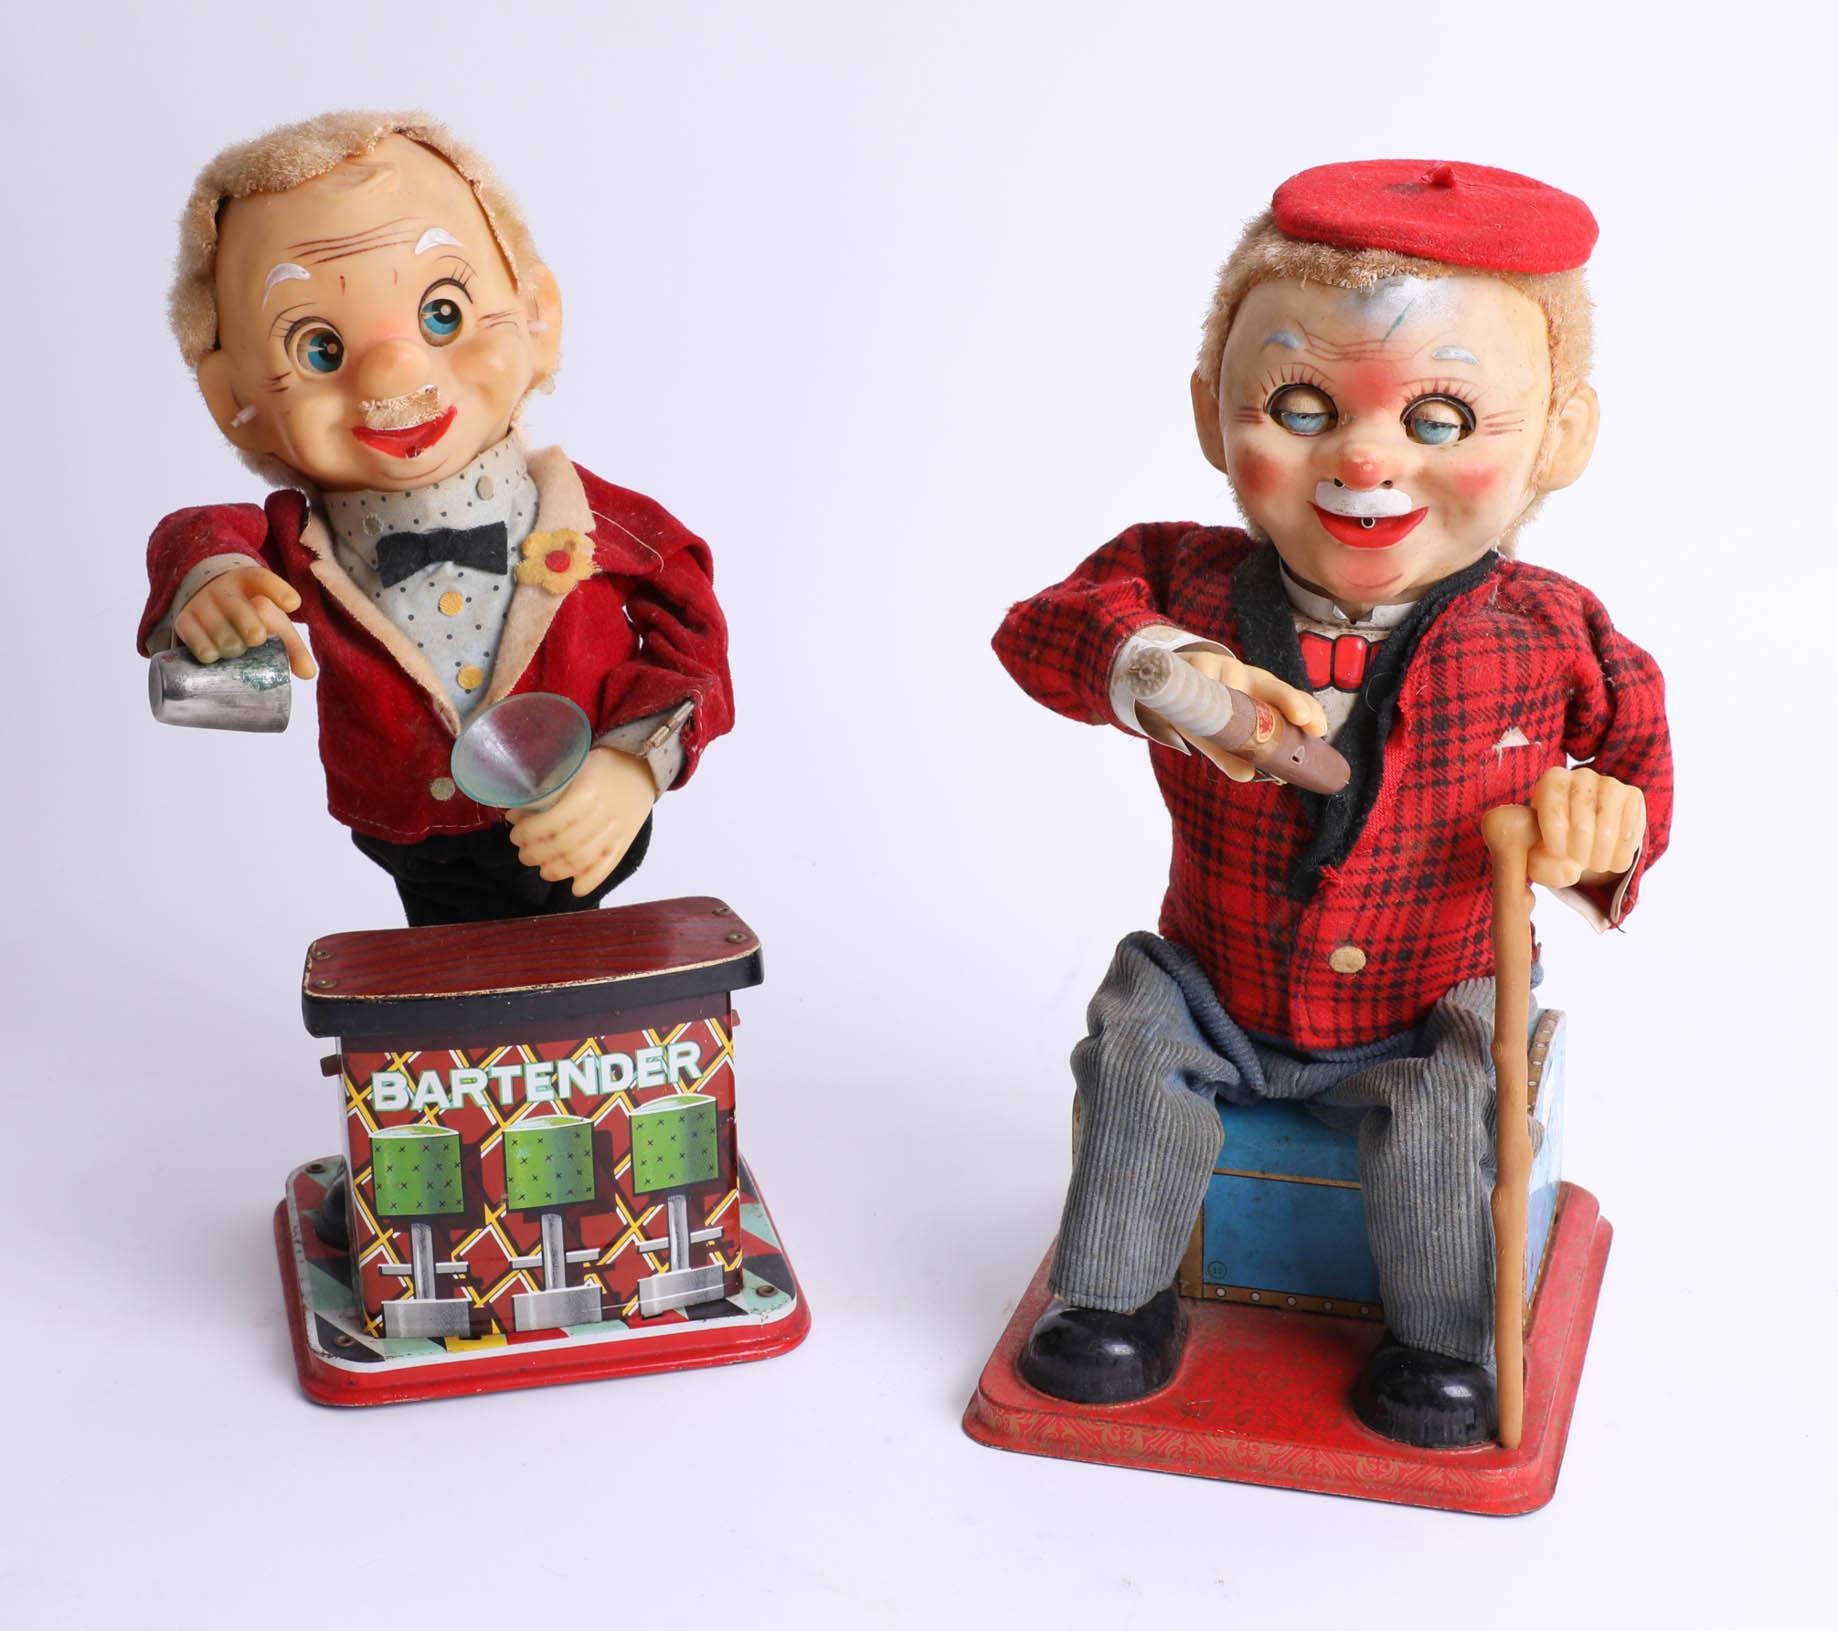 Two Rosko tinplate Japanese mechanical toys, 'Bartender' and 'McGregor'.